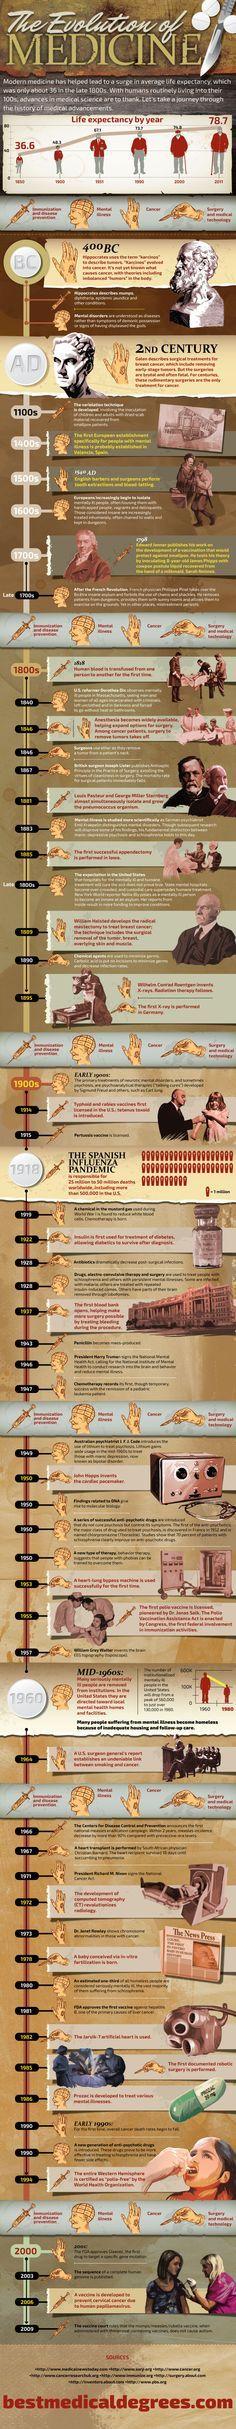 The Evolution of Medicine | A Health Education Infographic | BerryRipe.com